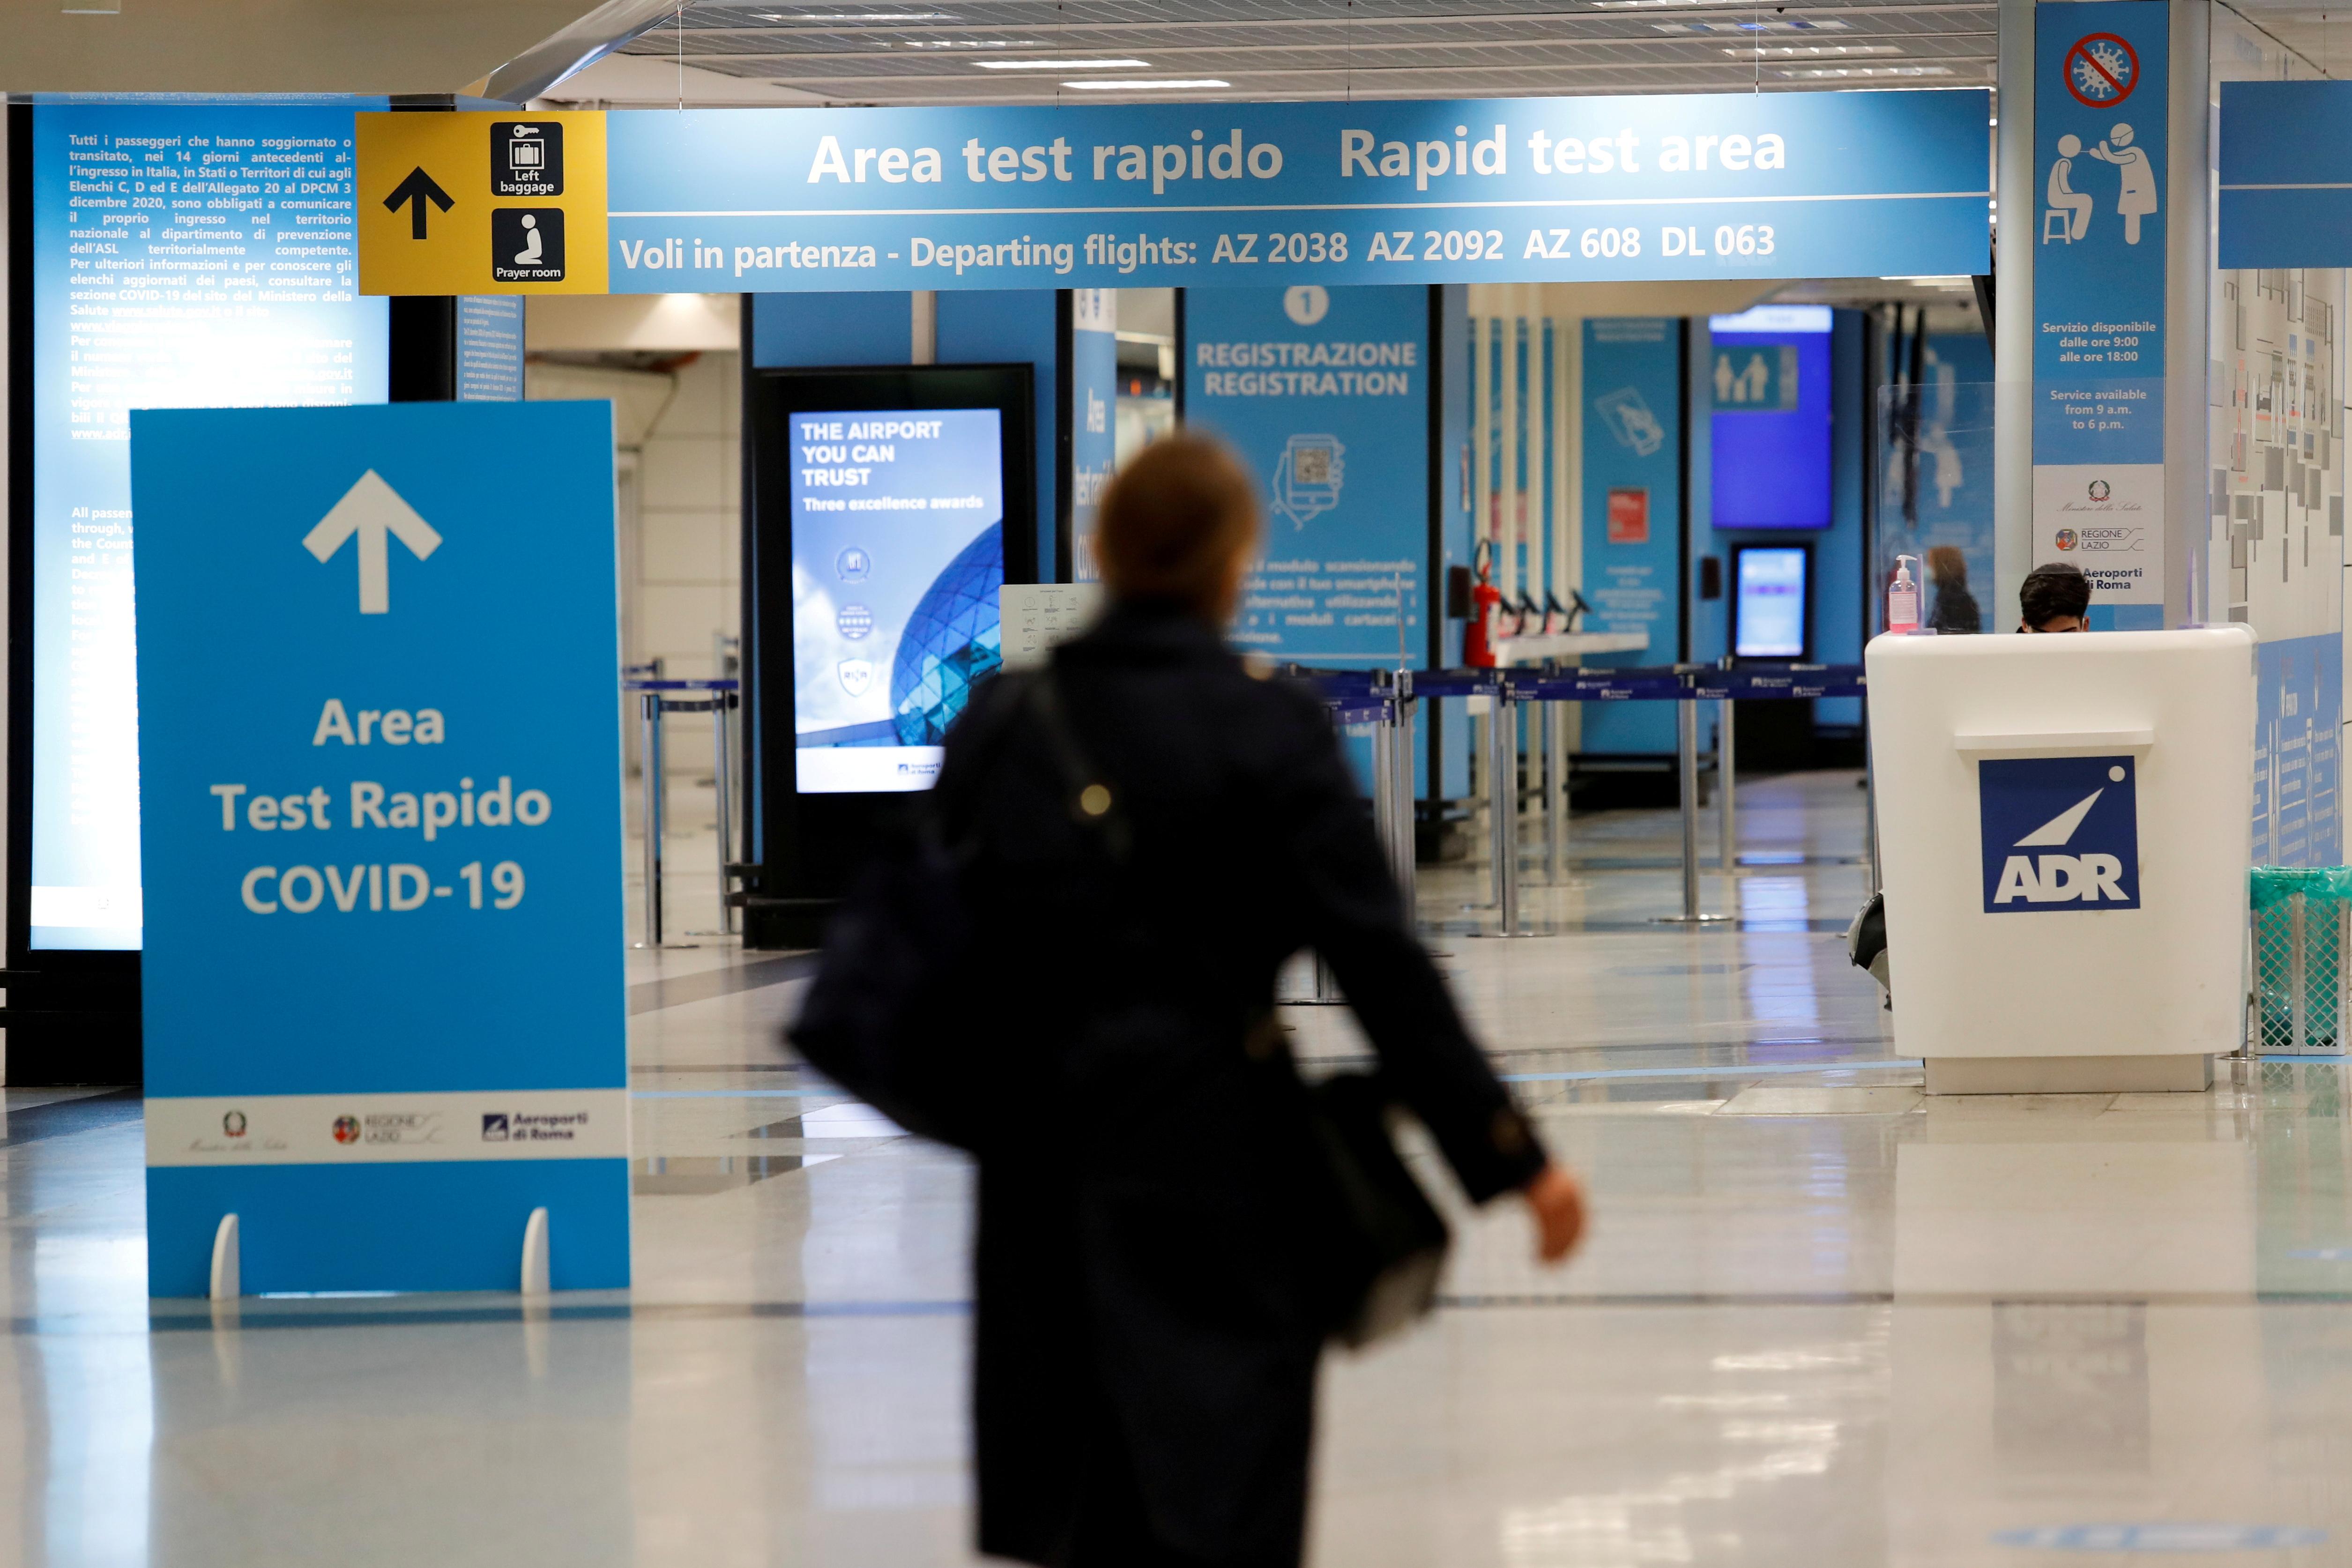 A person walks near a COVID-19 test area at Fiumicino airport in Rome, Italy, December 24, 2020. REUTERS/Remo Casilli/File Photo